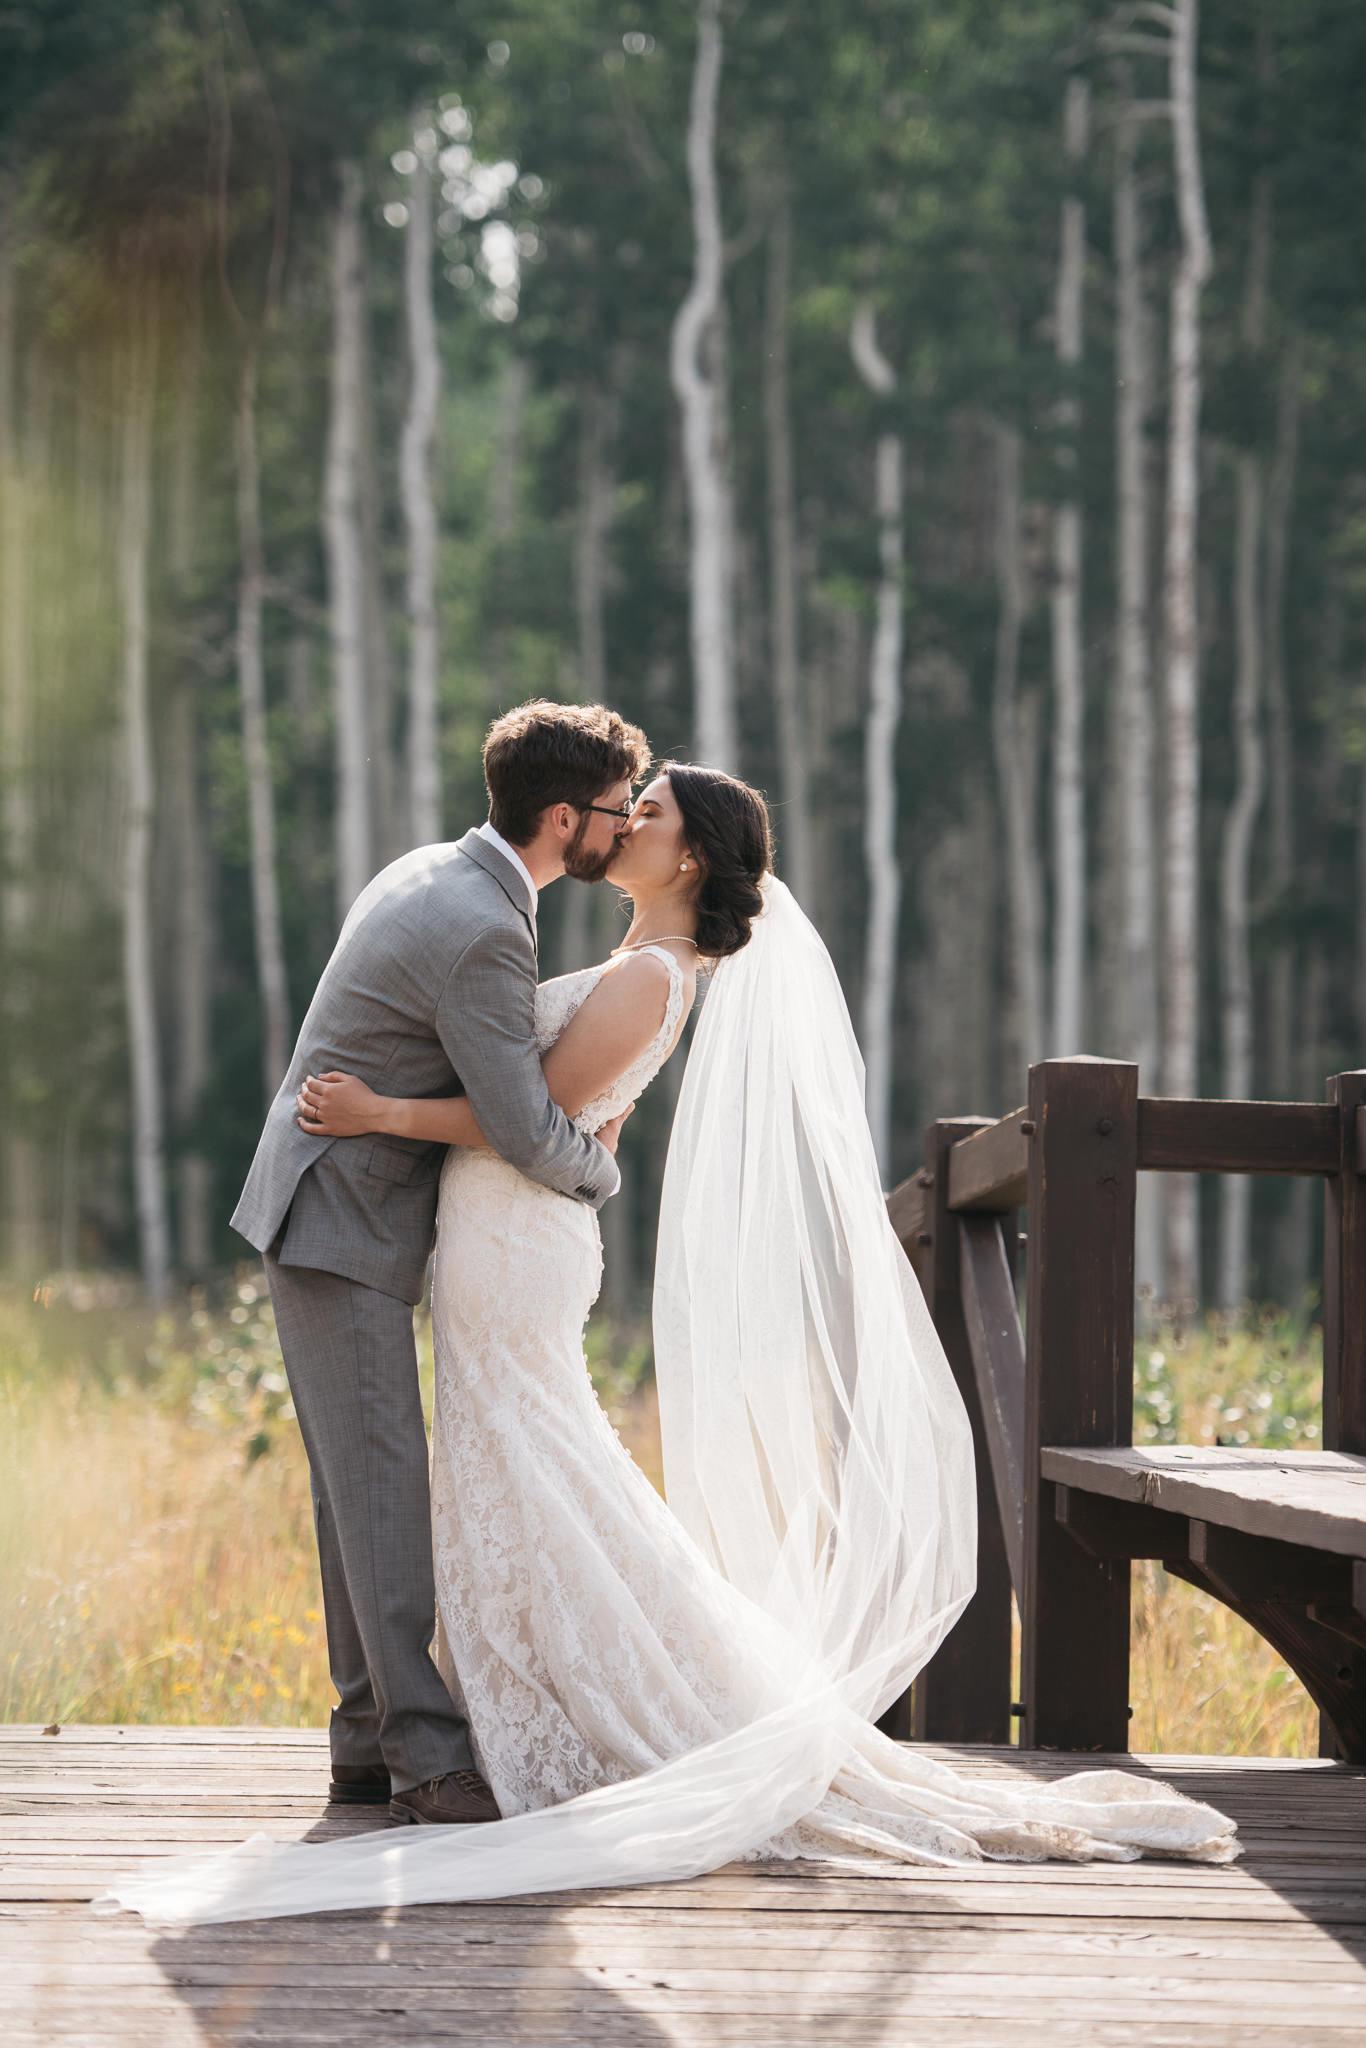 371_ONL_Kat_Nick_Wedding_Trevor_Hooper_Photo.jpg